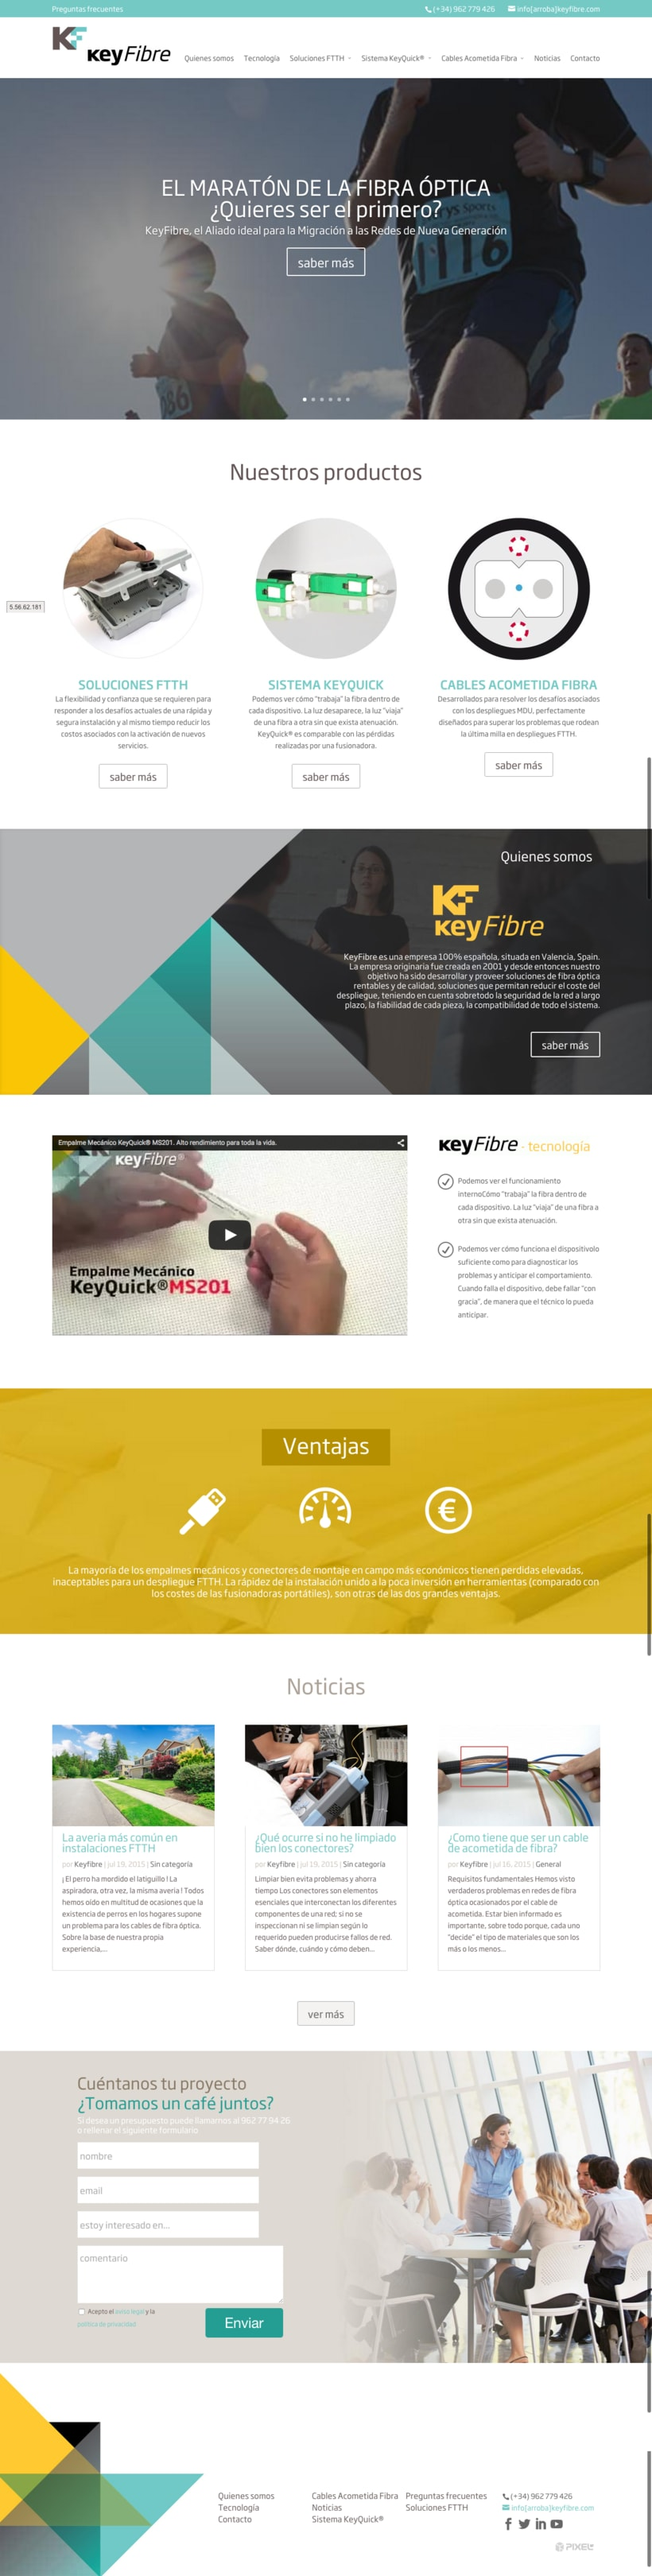 Web corporativa Keyfibre -1